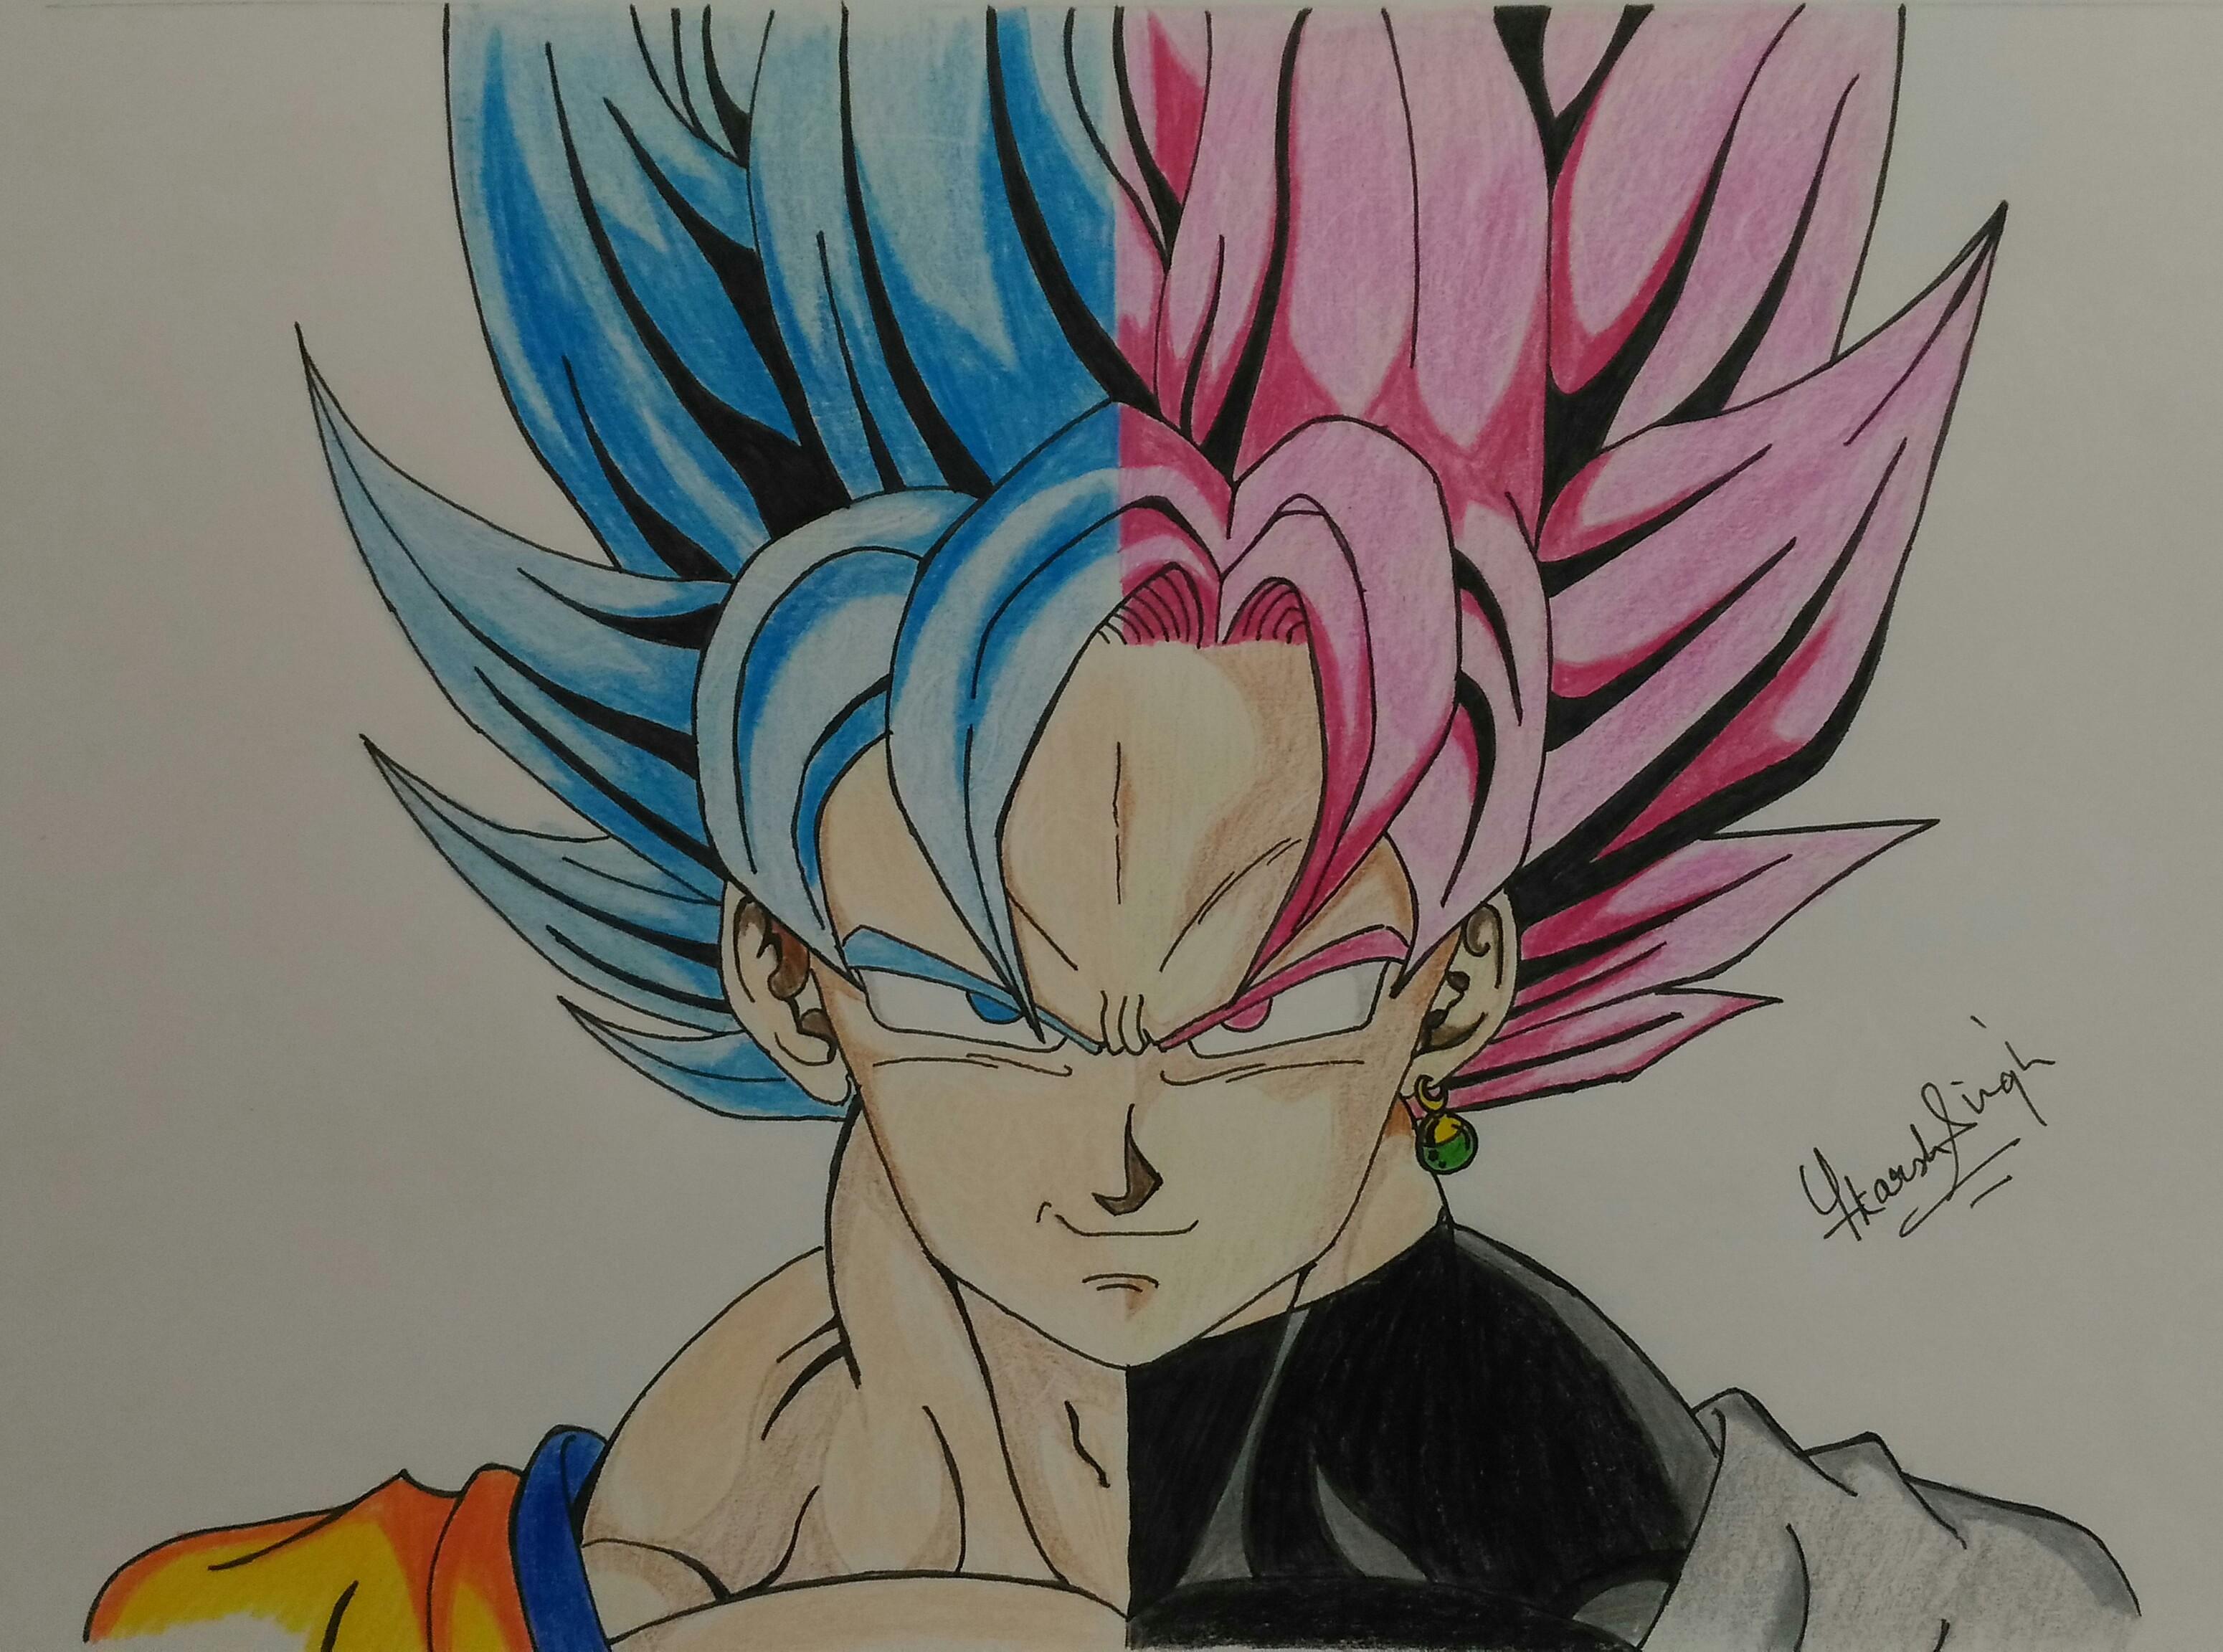 Black Goku Ssj Rose Para Colorear Dibujos Para Colorear